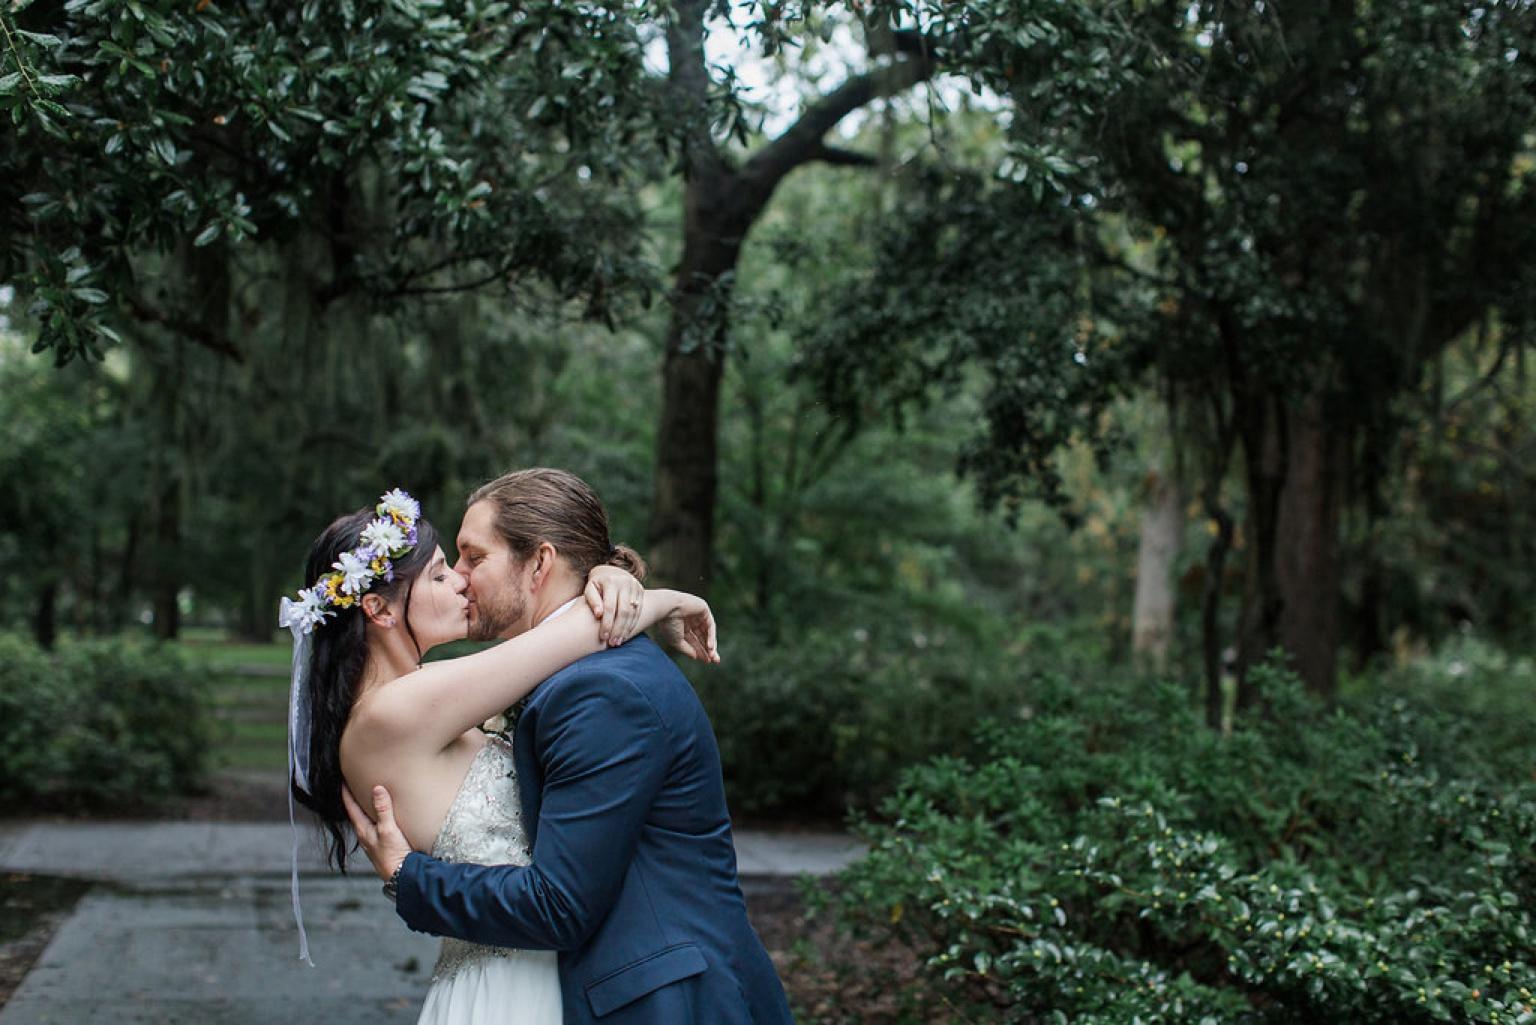 Apt_B_Photo_Savannah_Wedding_Photographer_Flower_Crown053.JPG